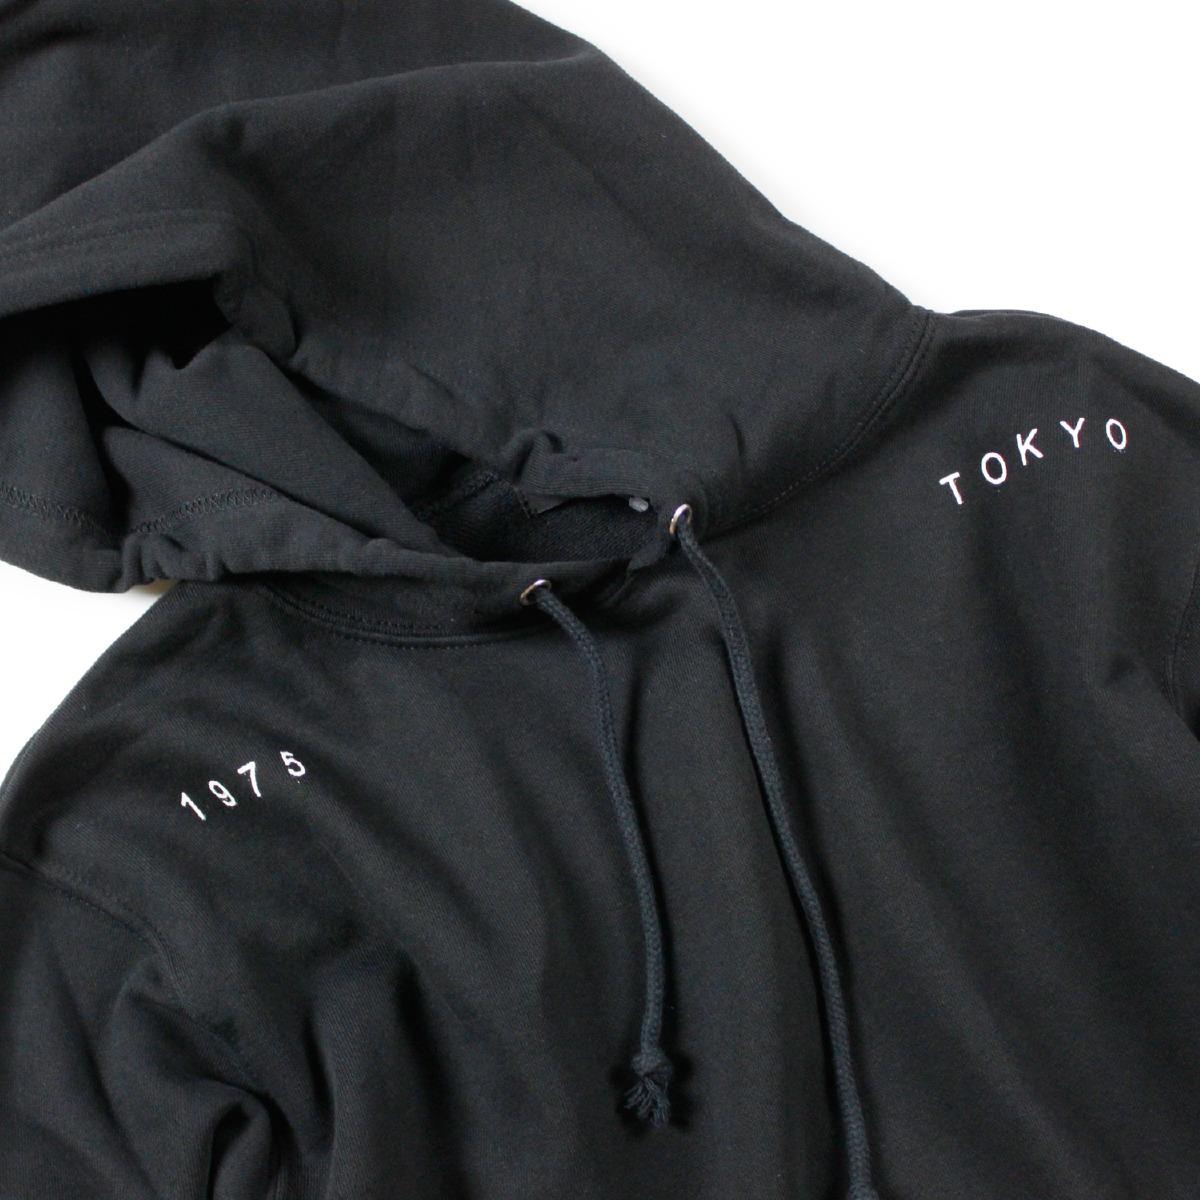 【30%OFF】1975 TOKYO 1975トーキョー EPIC P/O HOODY